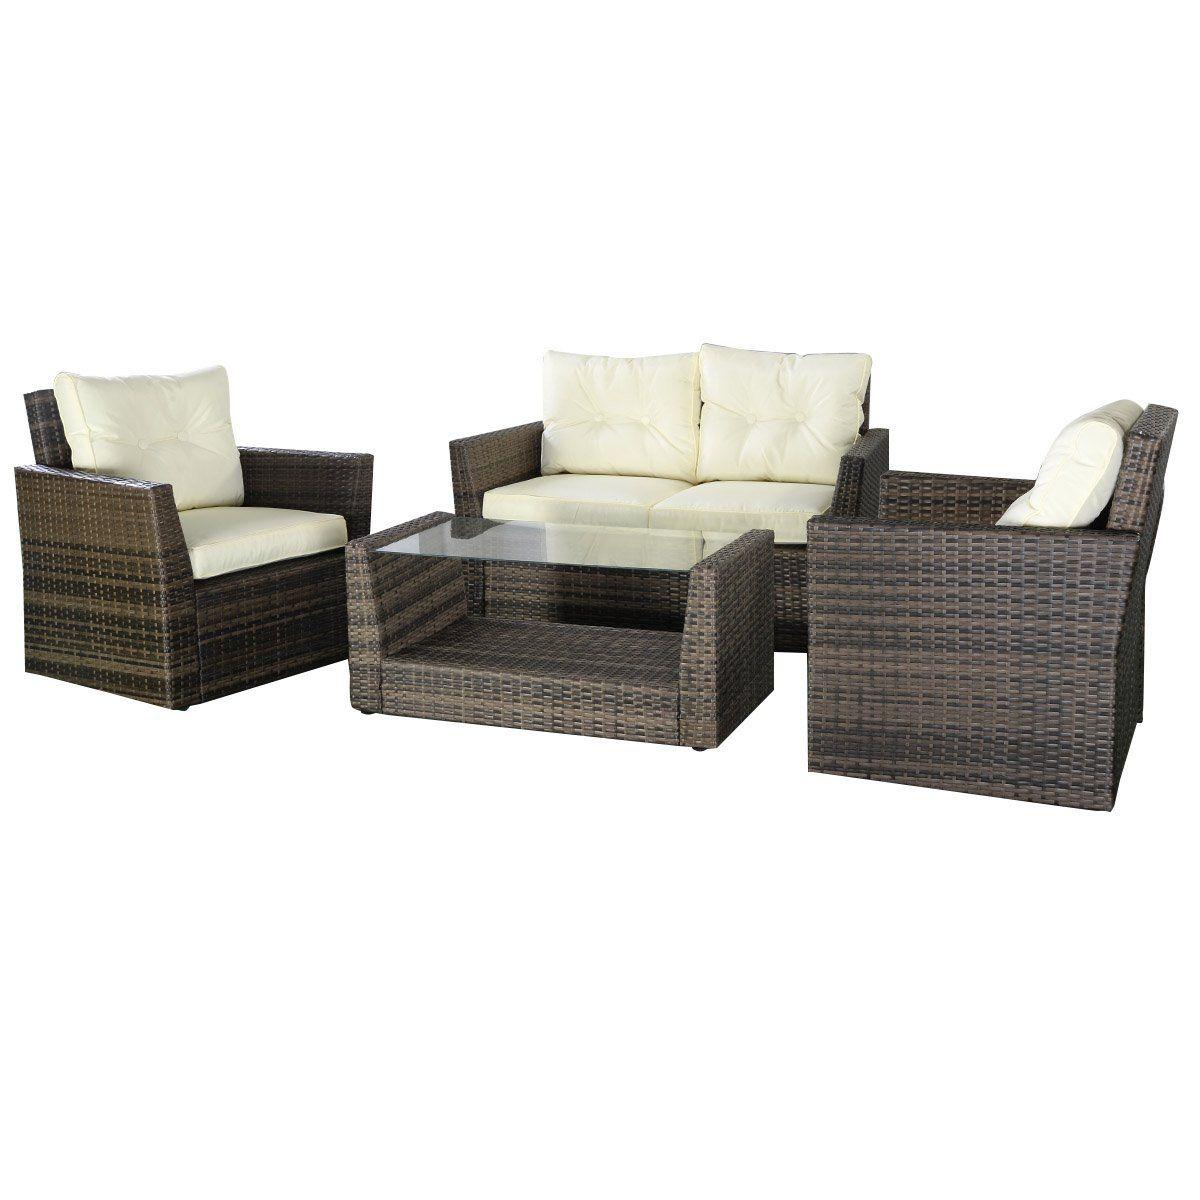 Amazon.com : Goplus Patio Lawn Cushioned Seat Rattan Sofa Furniture ...